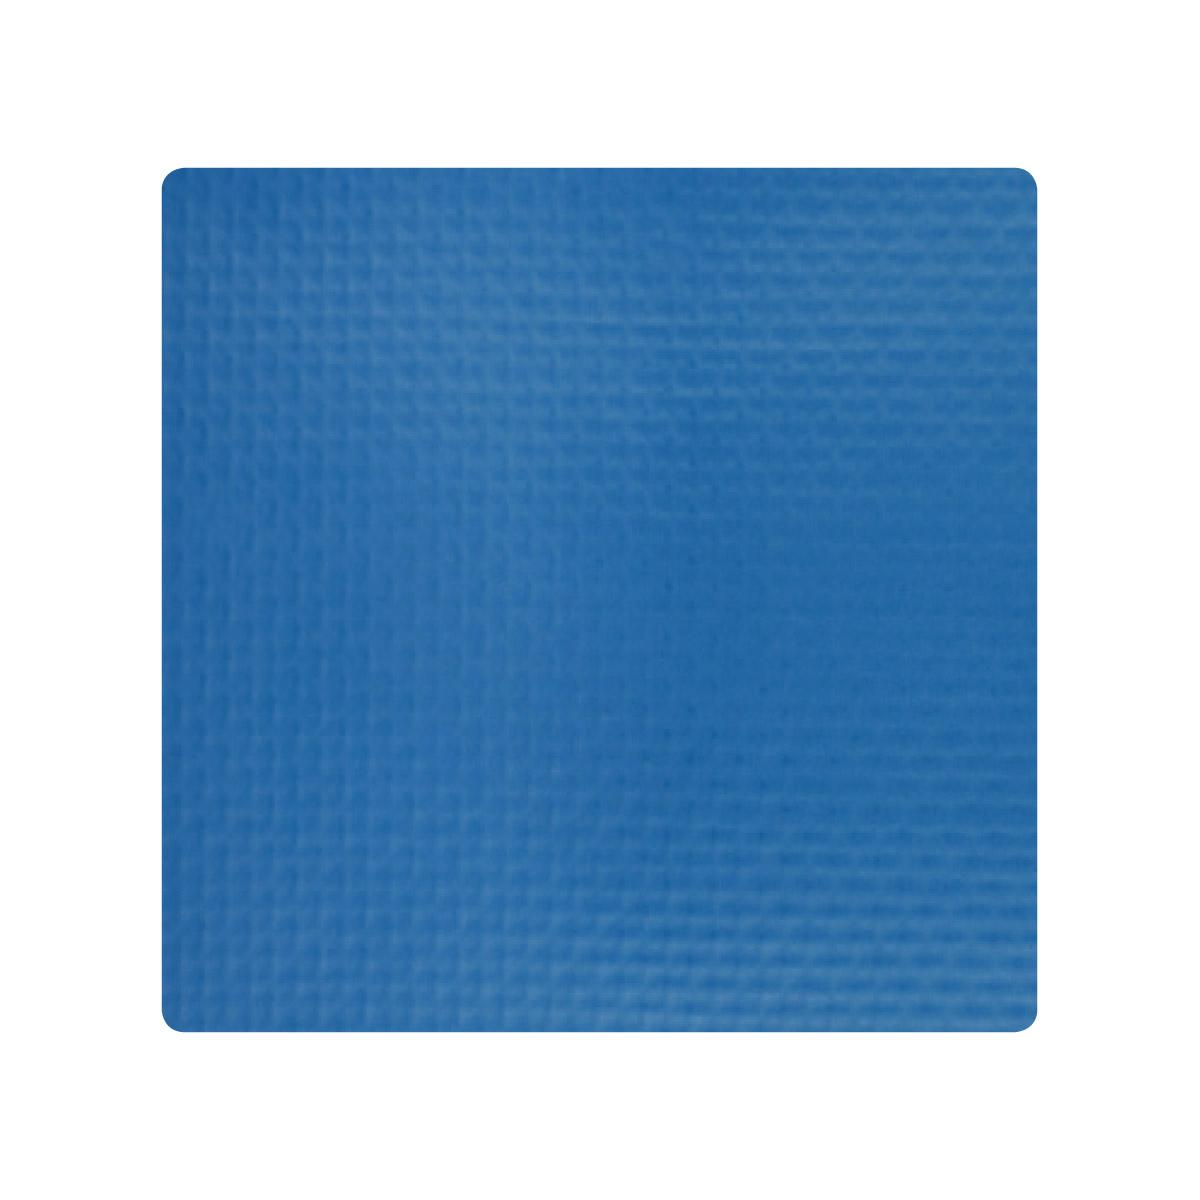 Schwimmbadfolie deluxe rutschfestt gewebeverstärkt PVC dunkelblau 1,5 x 165 cm l=20m Rolle  Schwimmbadfolie deluxe rutschfestt gewebeverstärkt PVC dunkelblau 1,5 x 165 cm l=20m Rolle